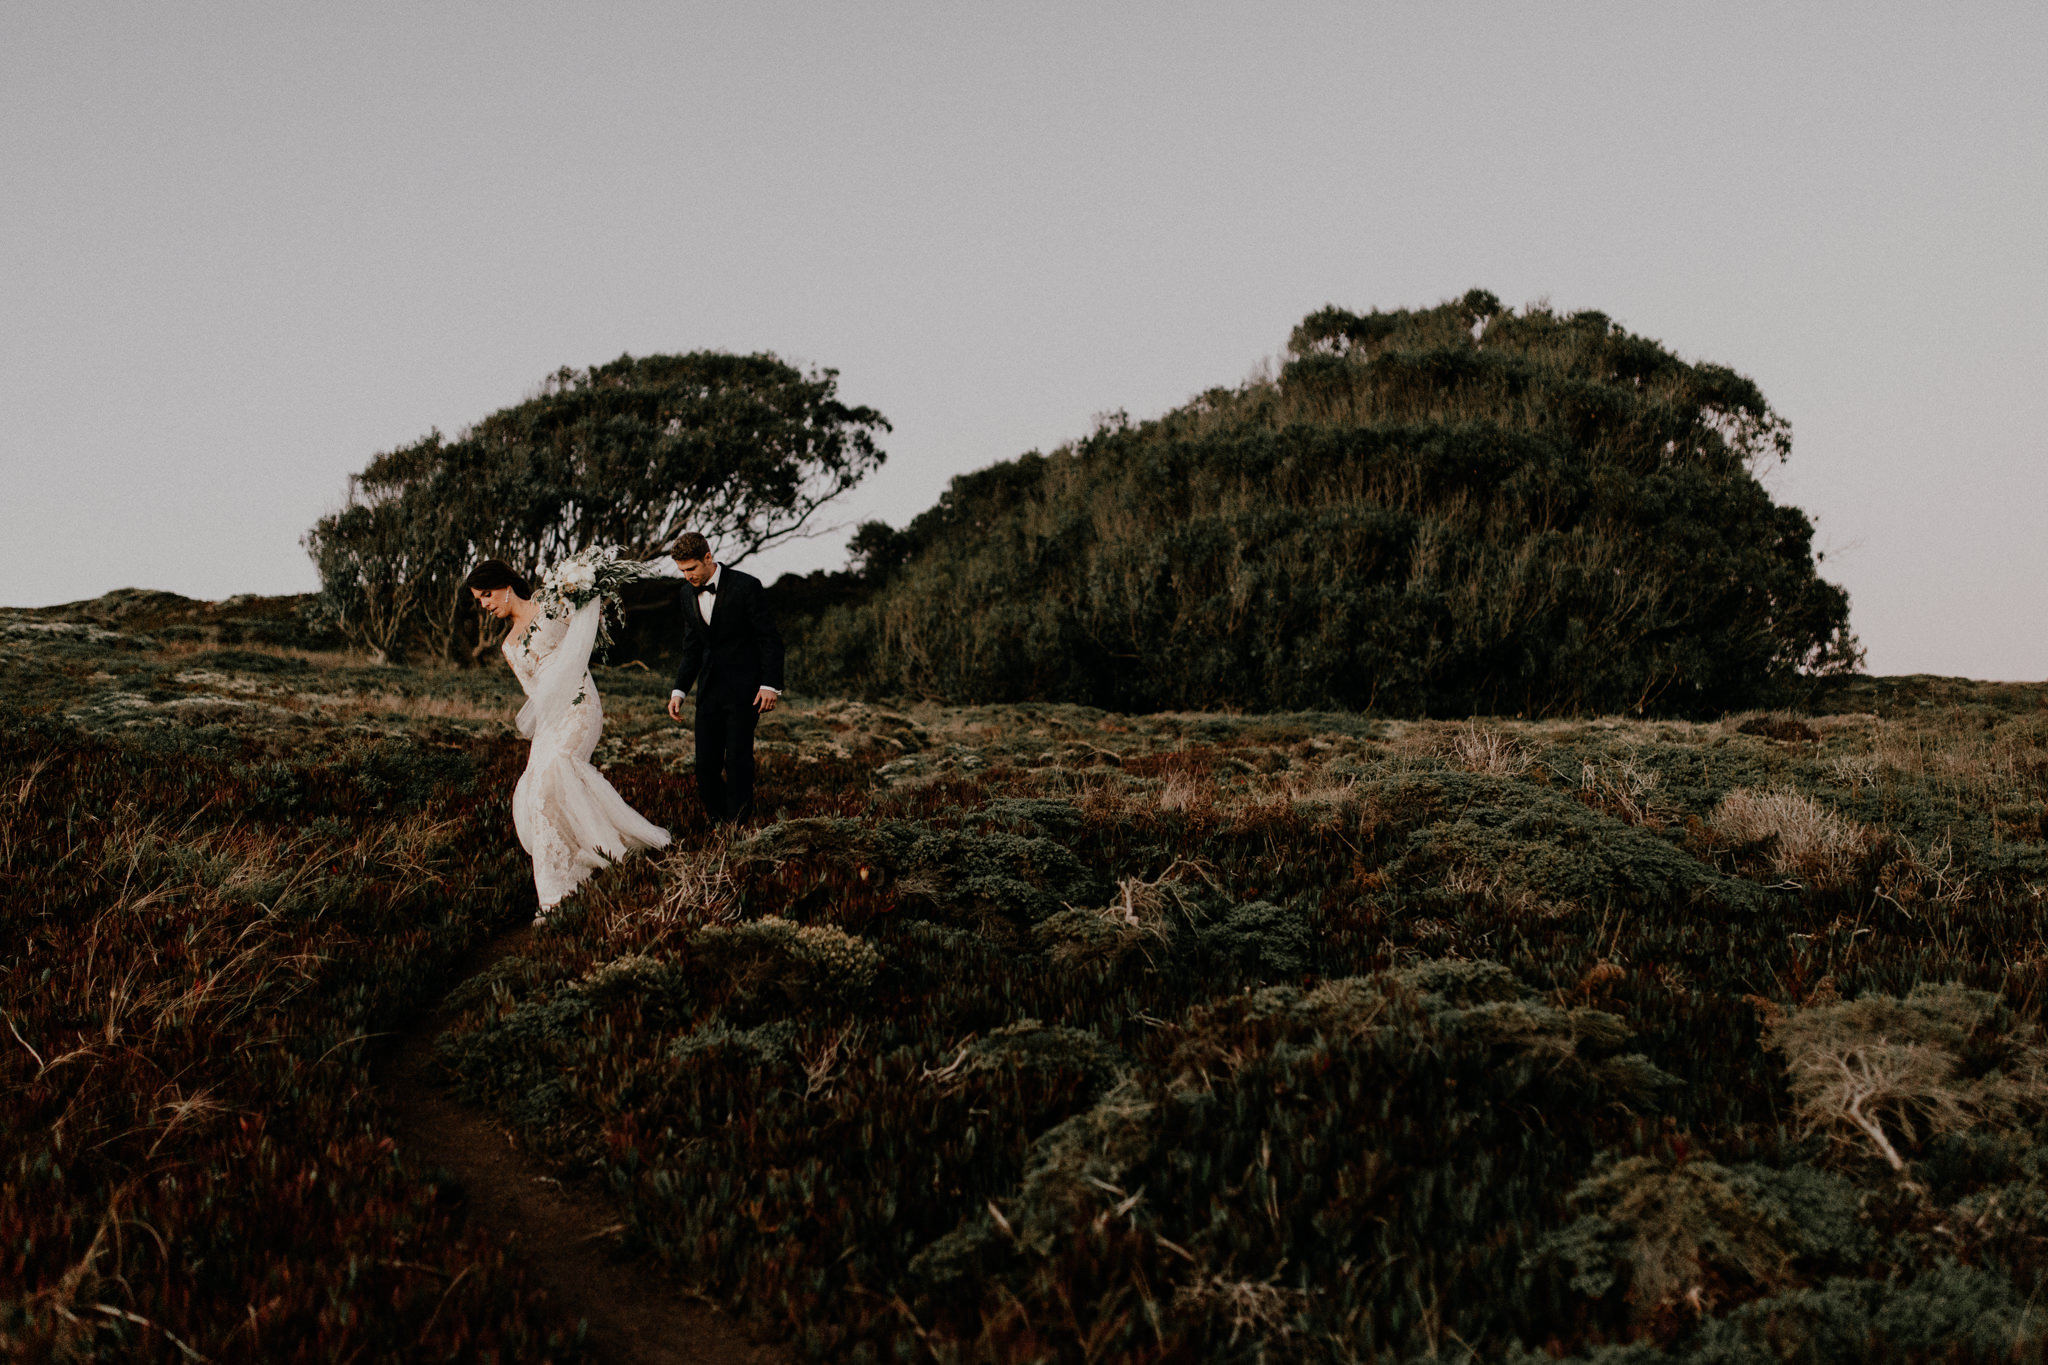 wedding-headlands-center-for-the-arts-sausalito-116.jpg